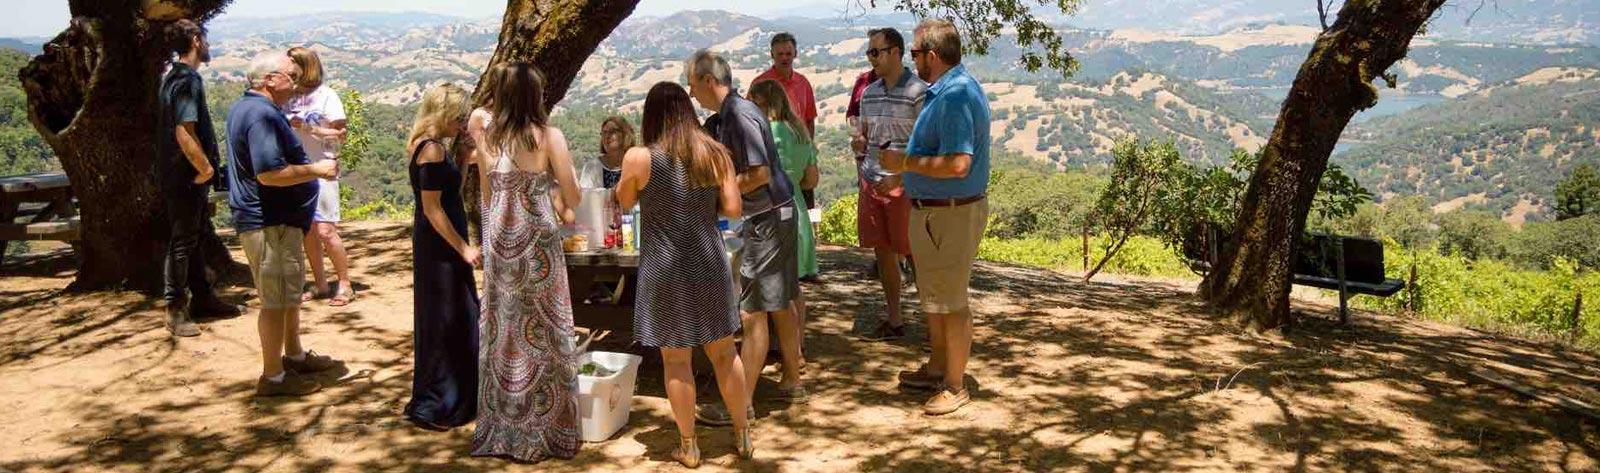 Sonoma Valley Wine Tours Belvedere